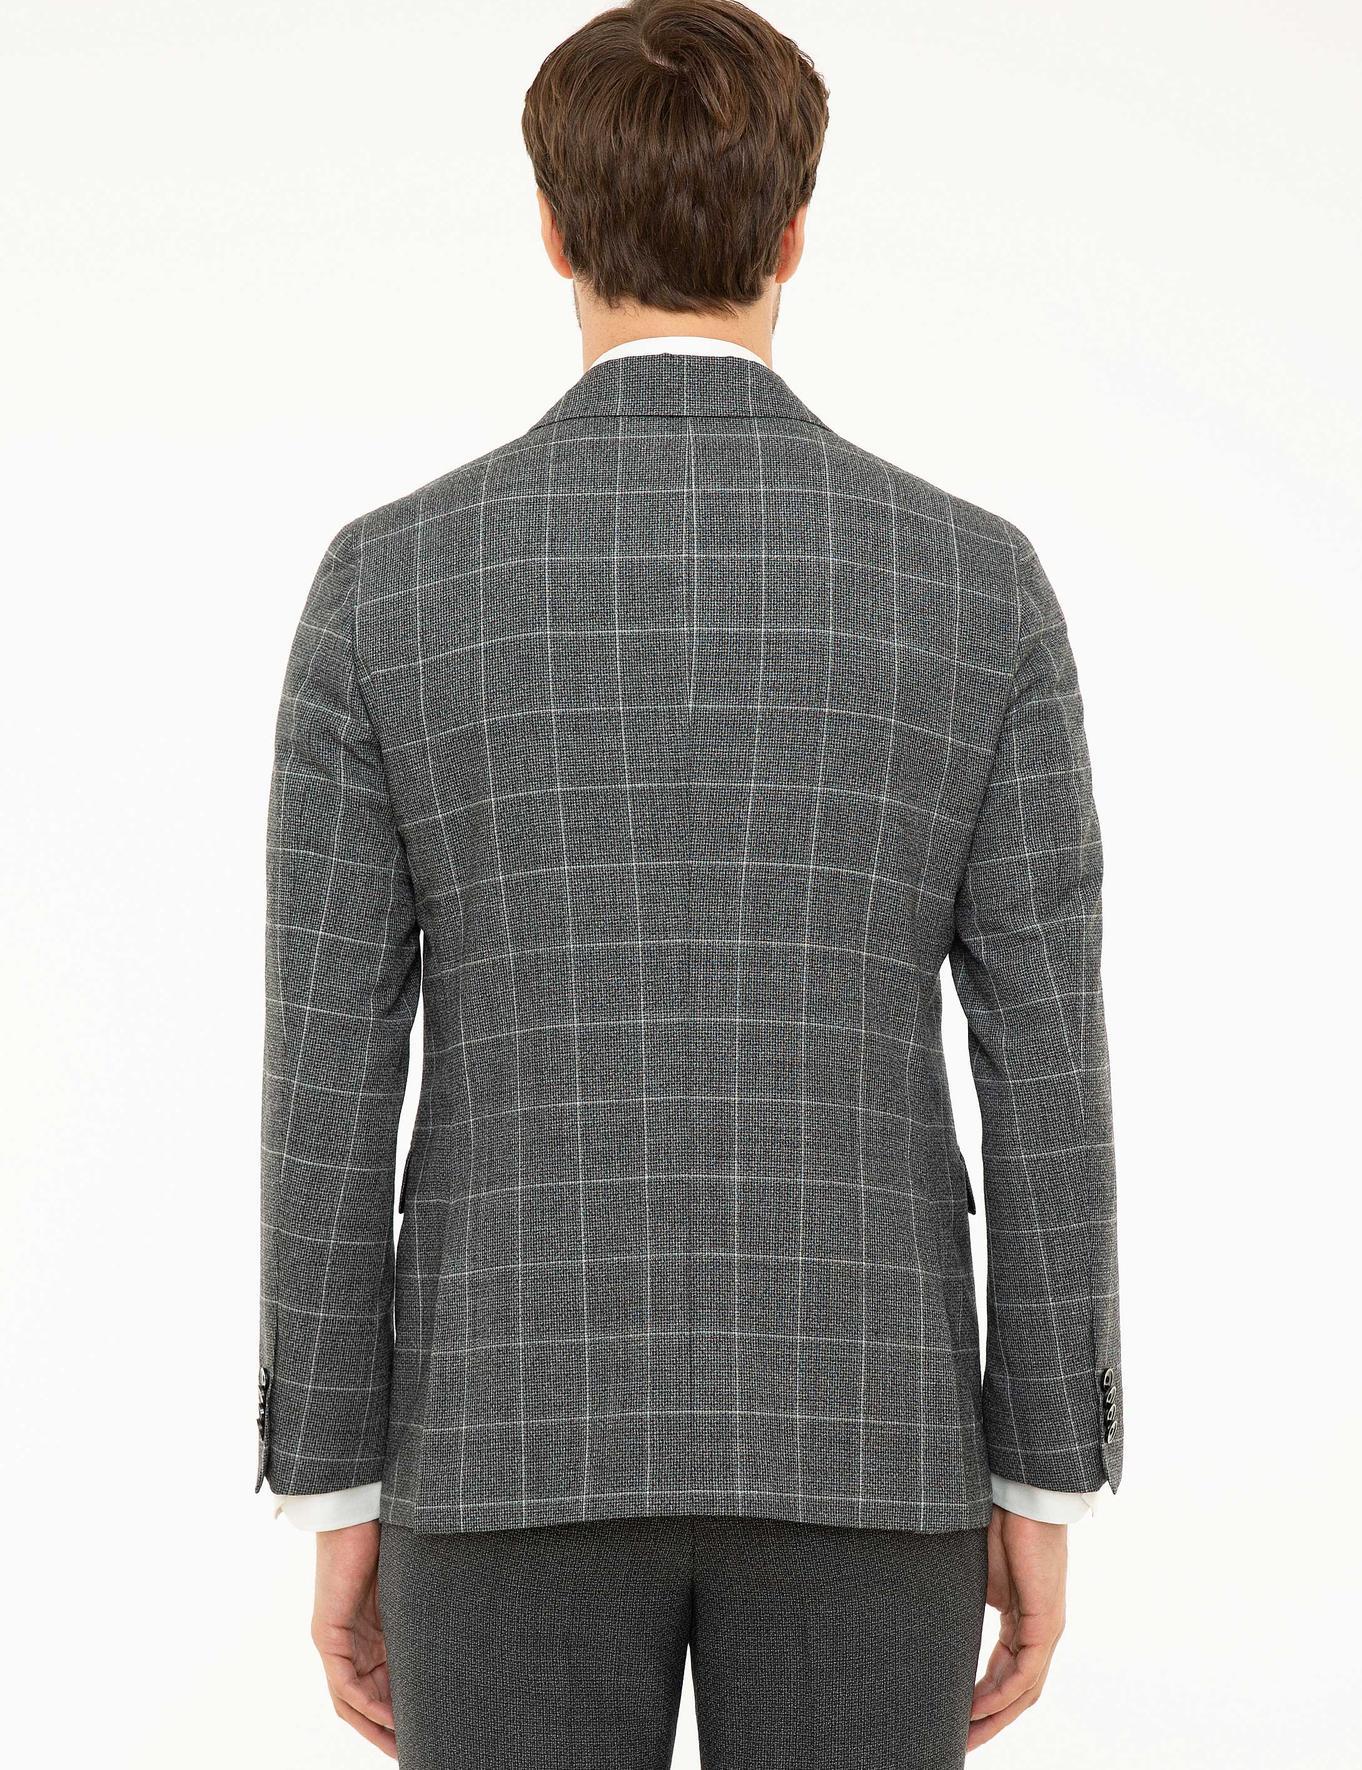 Siyah Slim Fit Ceket - 50211452017